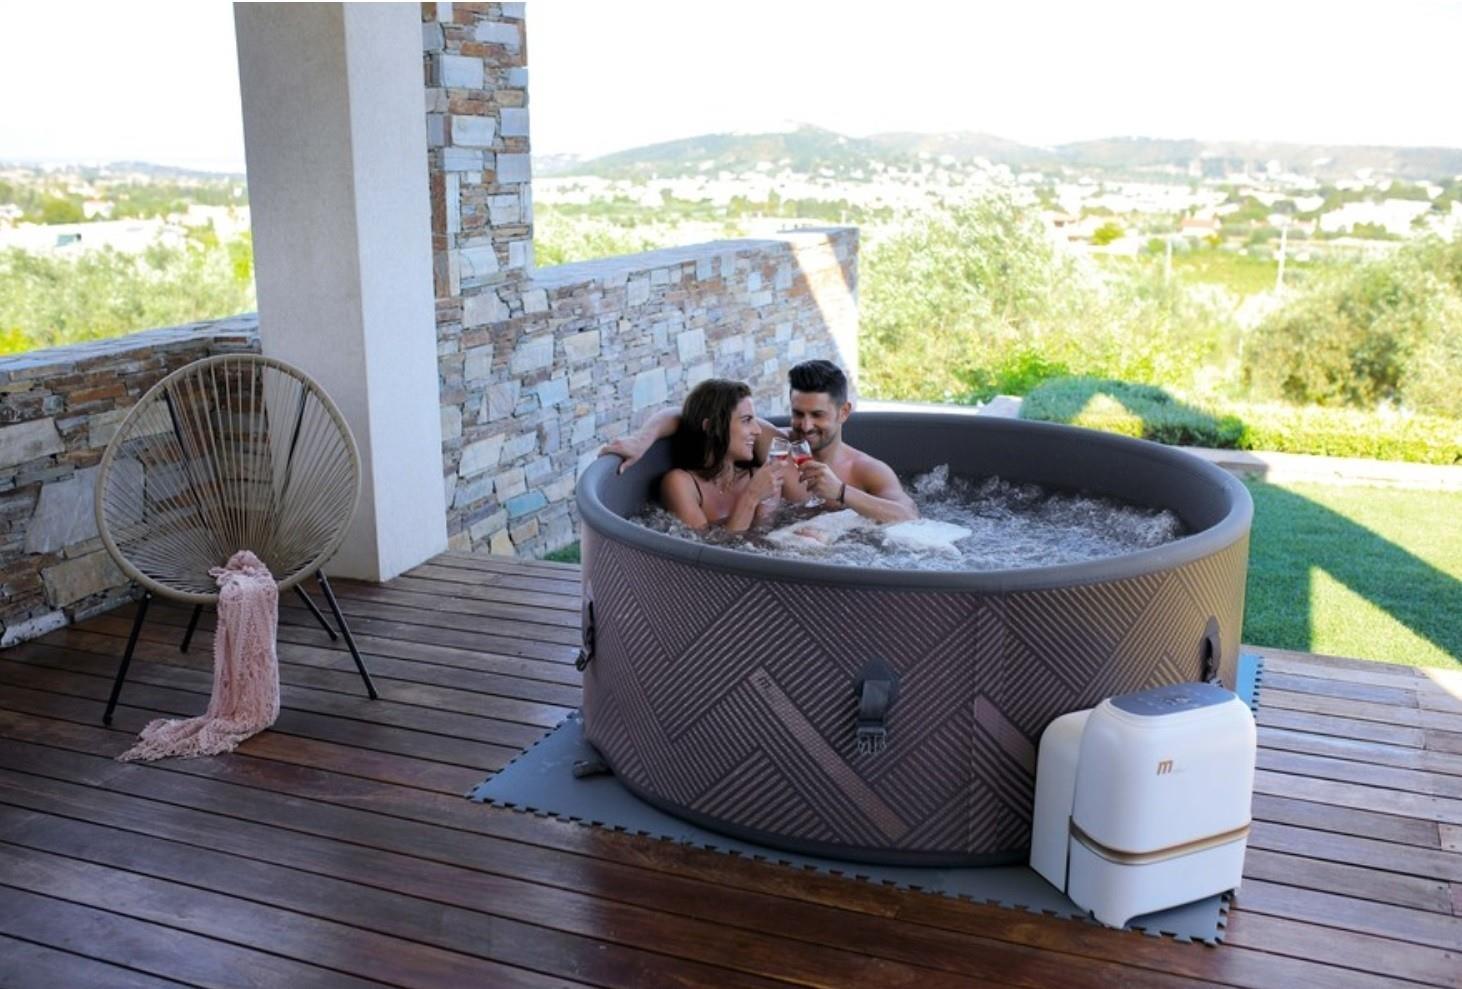 Mspa Mono 6//4 Bathers Inflatable Hot Tub Spa Jacuzzi Cover Home Holiday Family